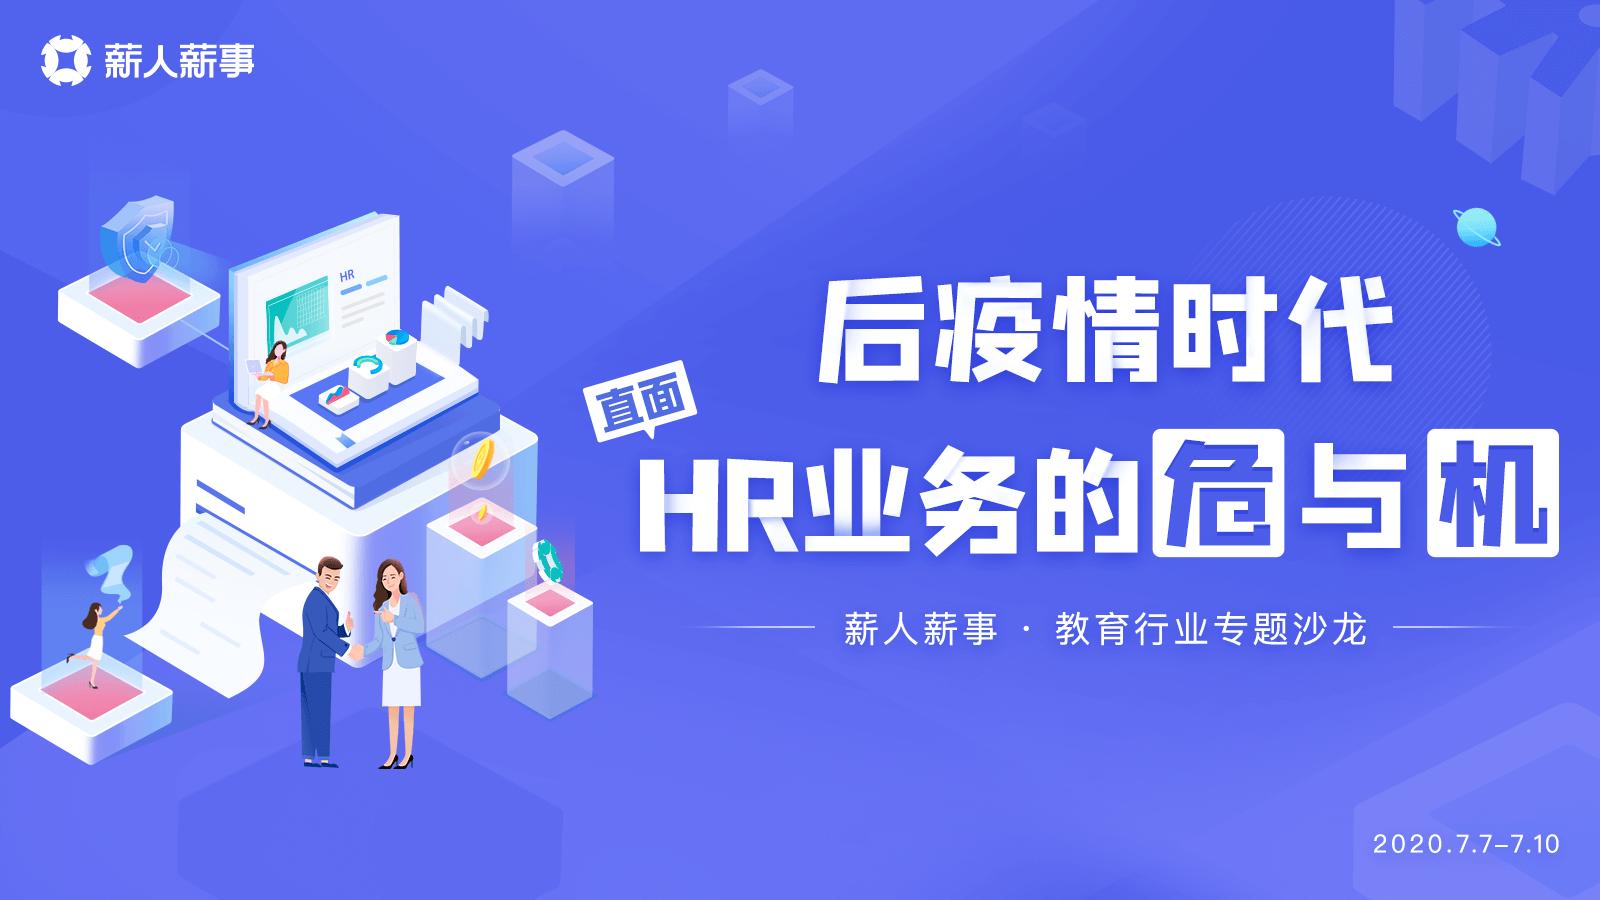 HR研究院_互联网时代的HR知识库_薪人薪事